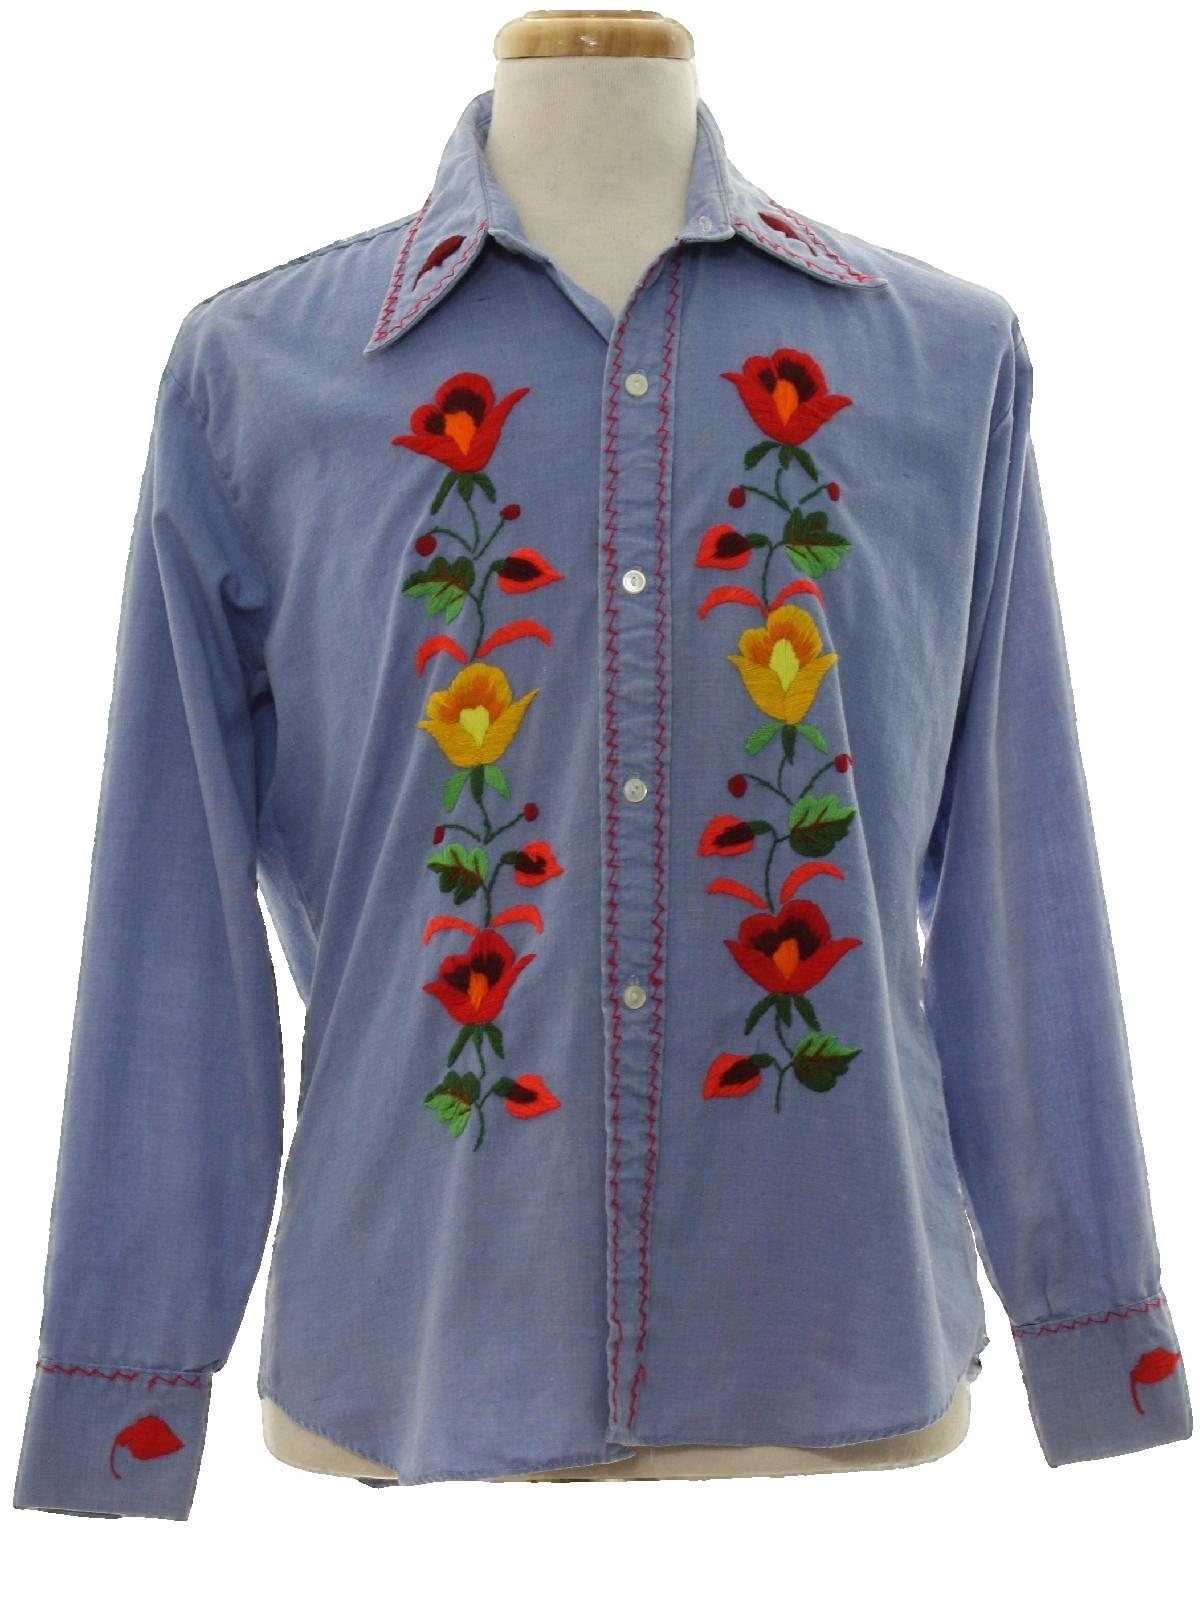 S vintage hippie shirt no label mens dusty light